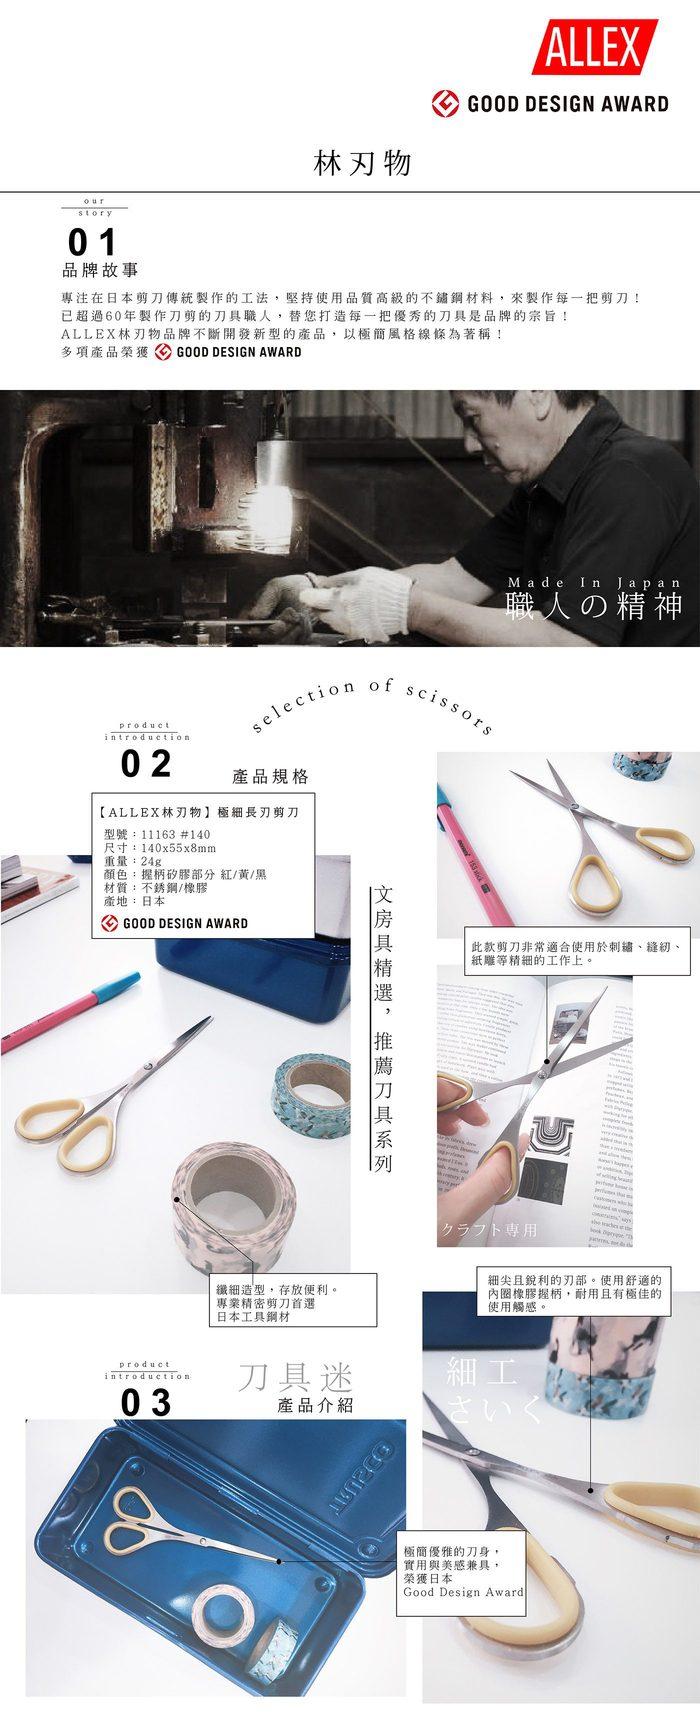 ALLEX林刃物|極細短刃剪刀-黃